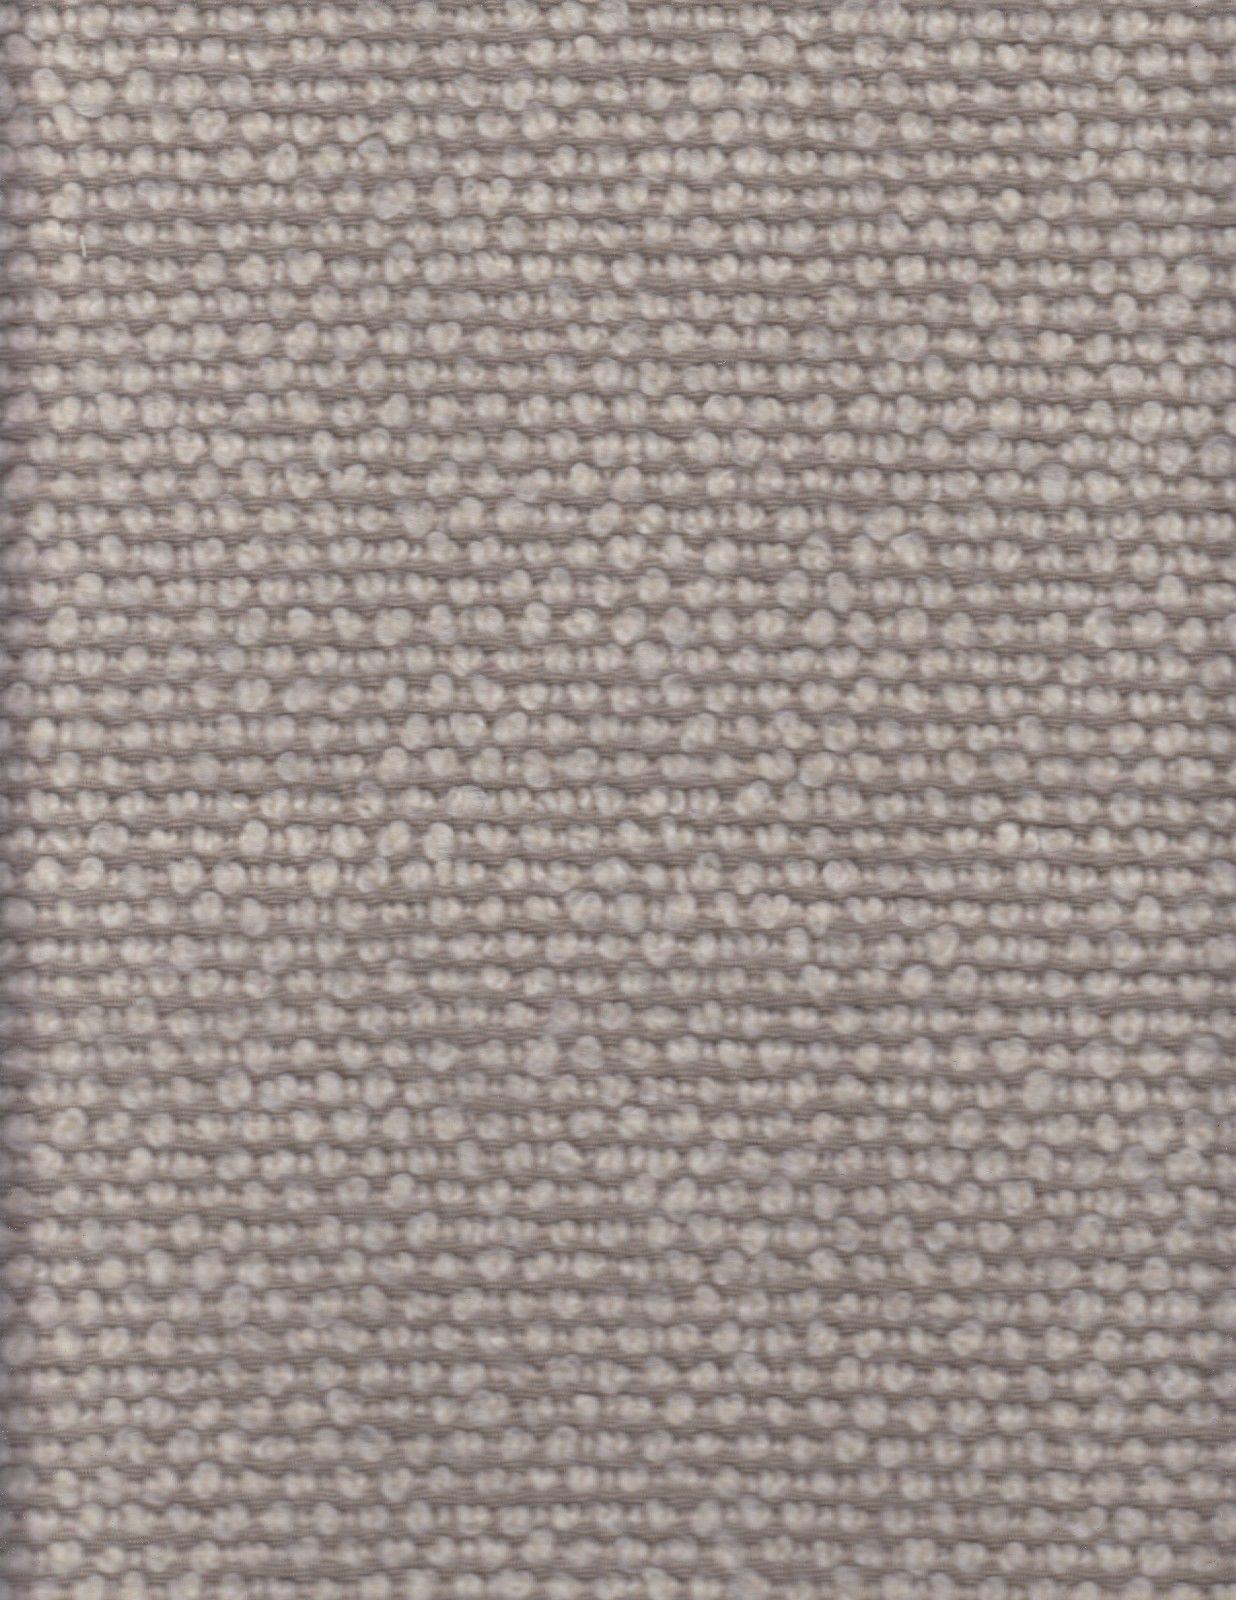 4.5 yds Bernhardt Upholstery Fabric MCM Muse Nubby Wool 3454-002 Dune Q